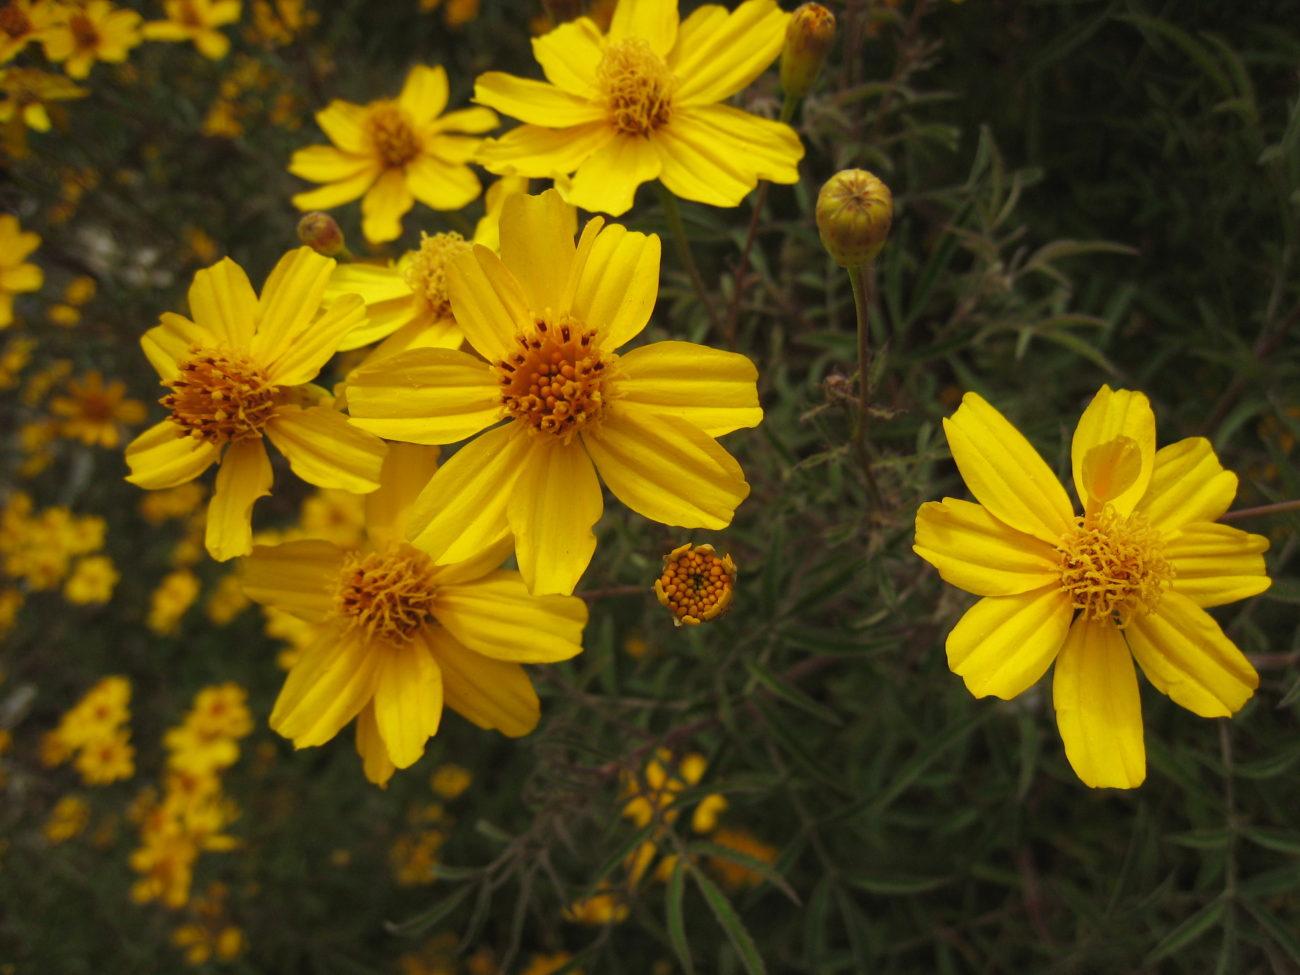 lemmon marigold(Tagetes lemmonii) - Excellent nectar plant.